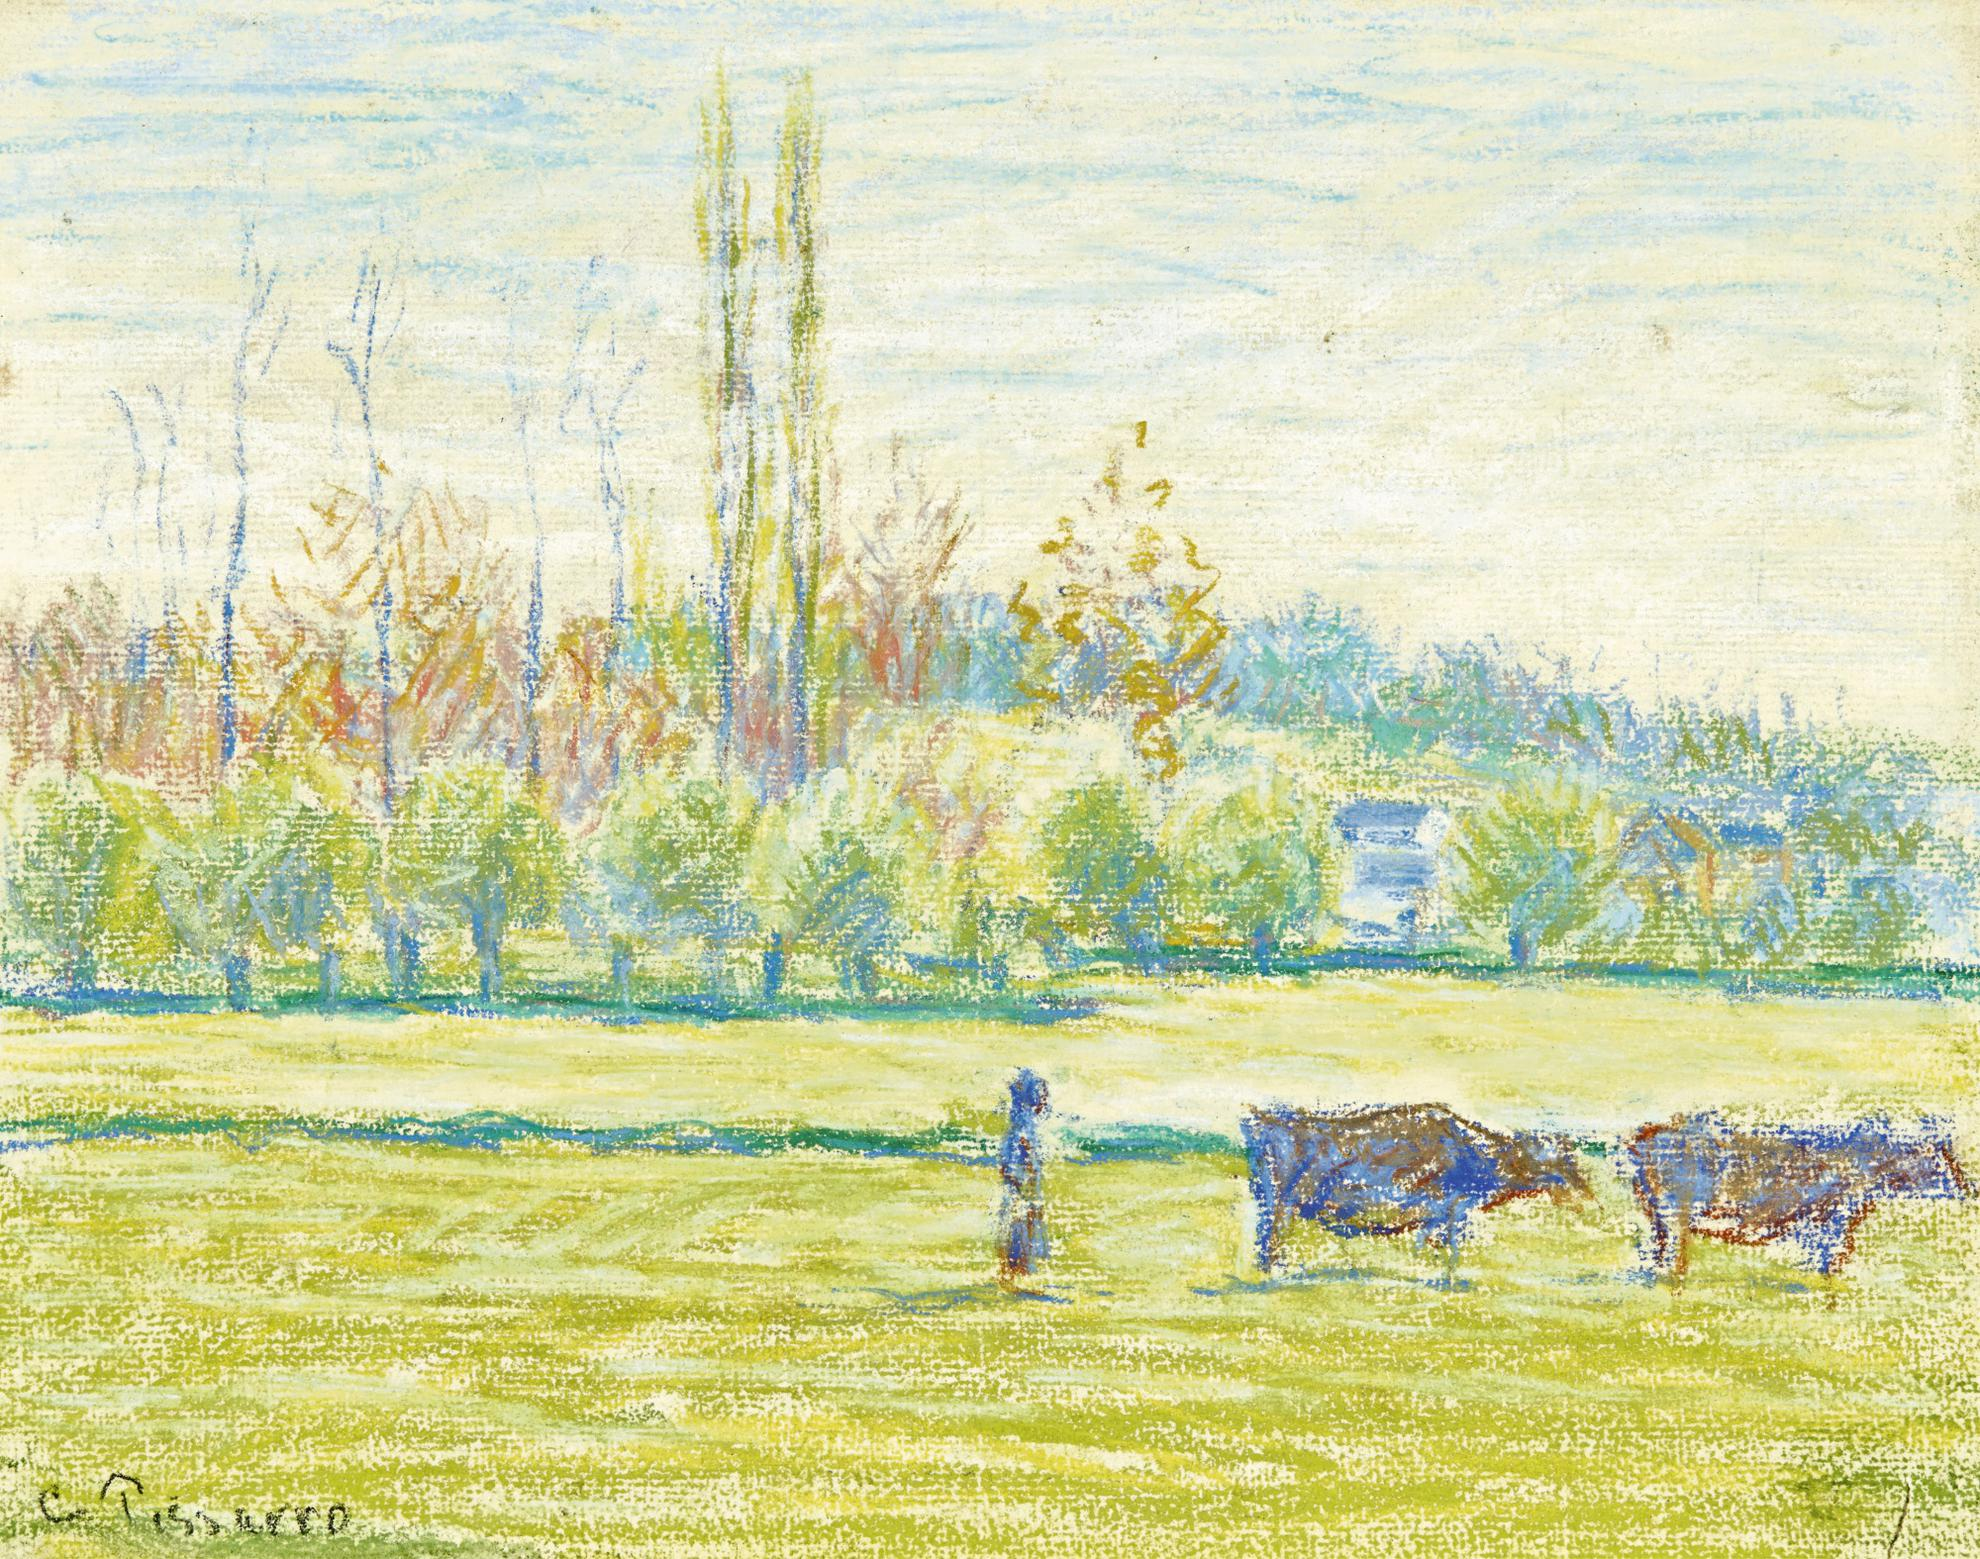 Camille Pissarro-Les Pres A Eragny-1887